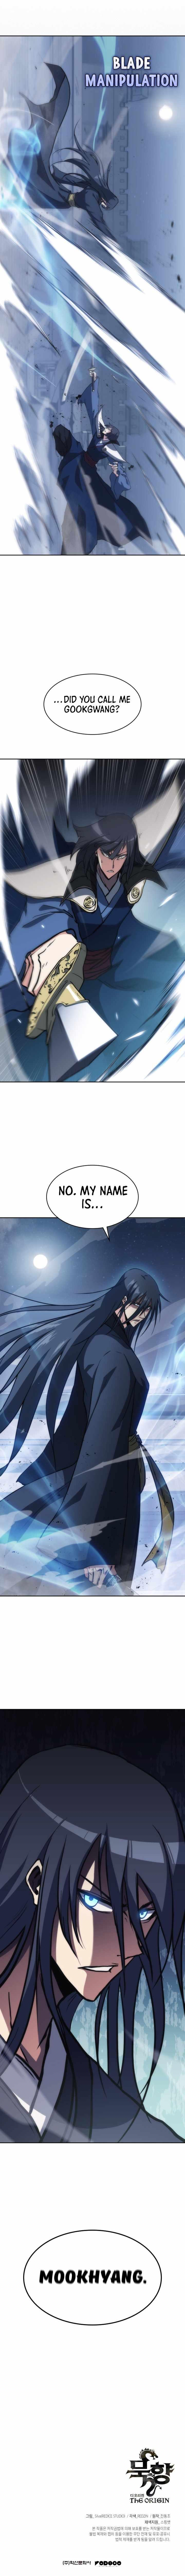 Mukhyang The Origin - chapter 38-eng-li